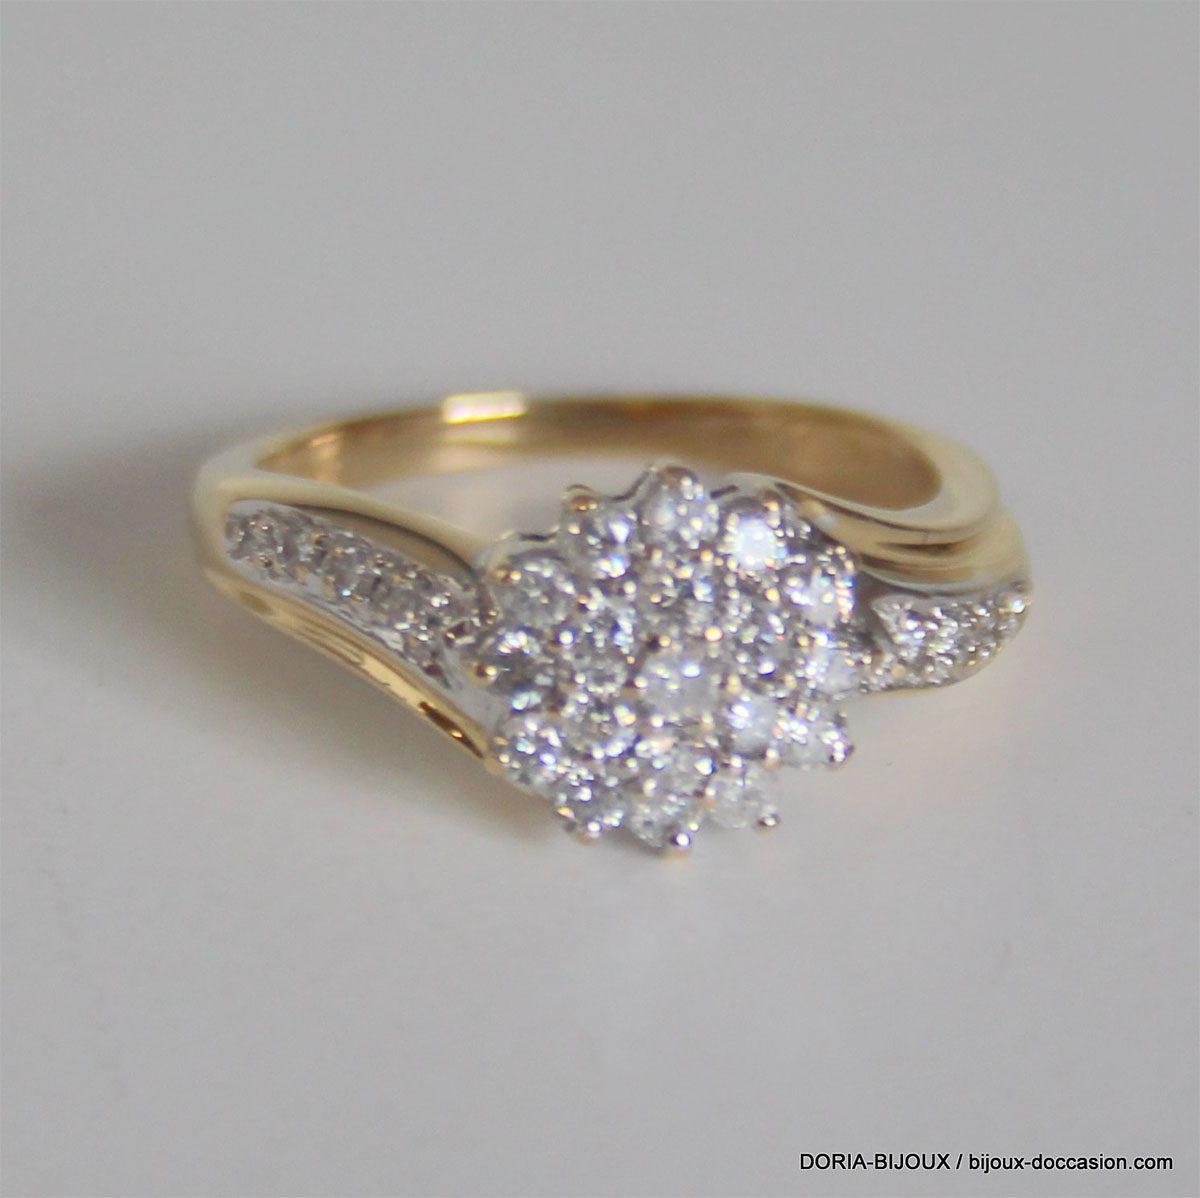 Bague Or Bicolor 18k 750  Diamants- 4.2grs - 50